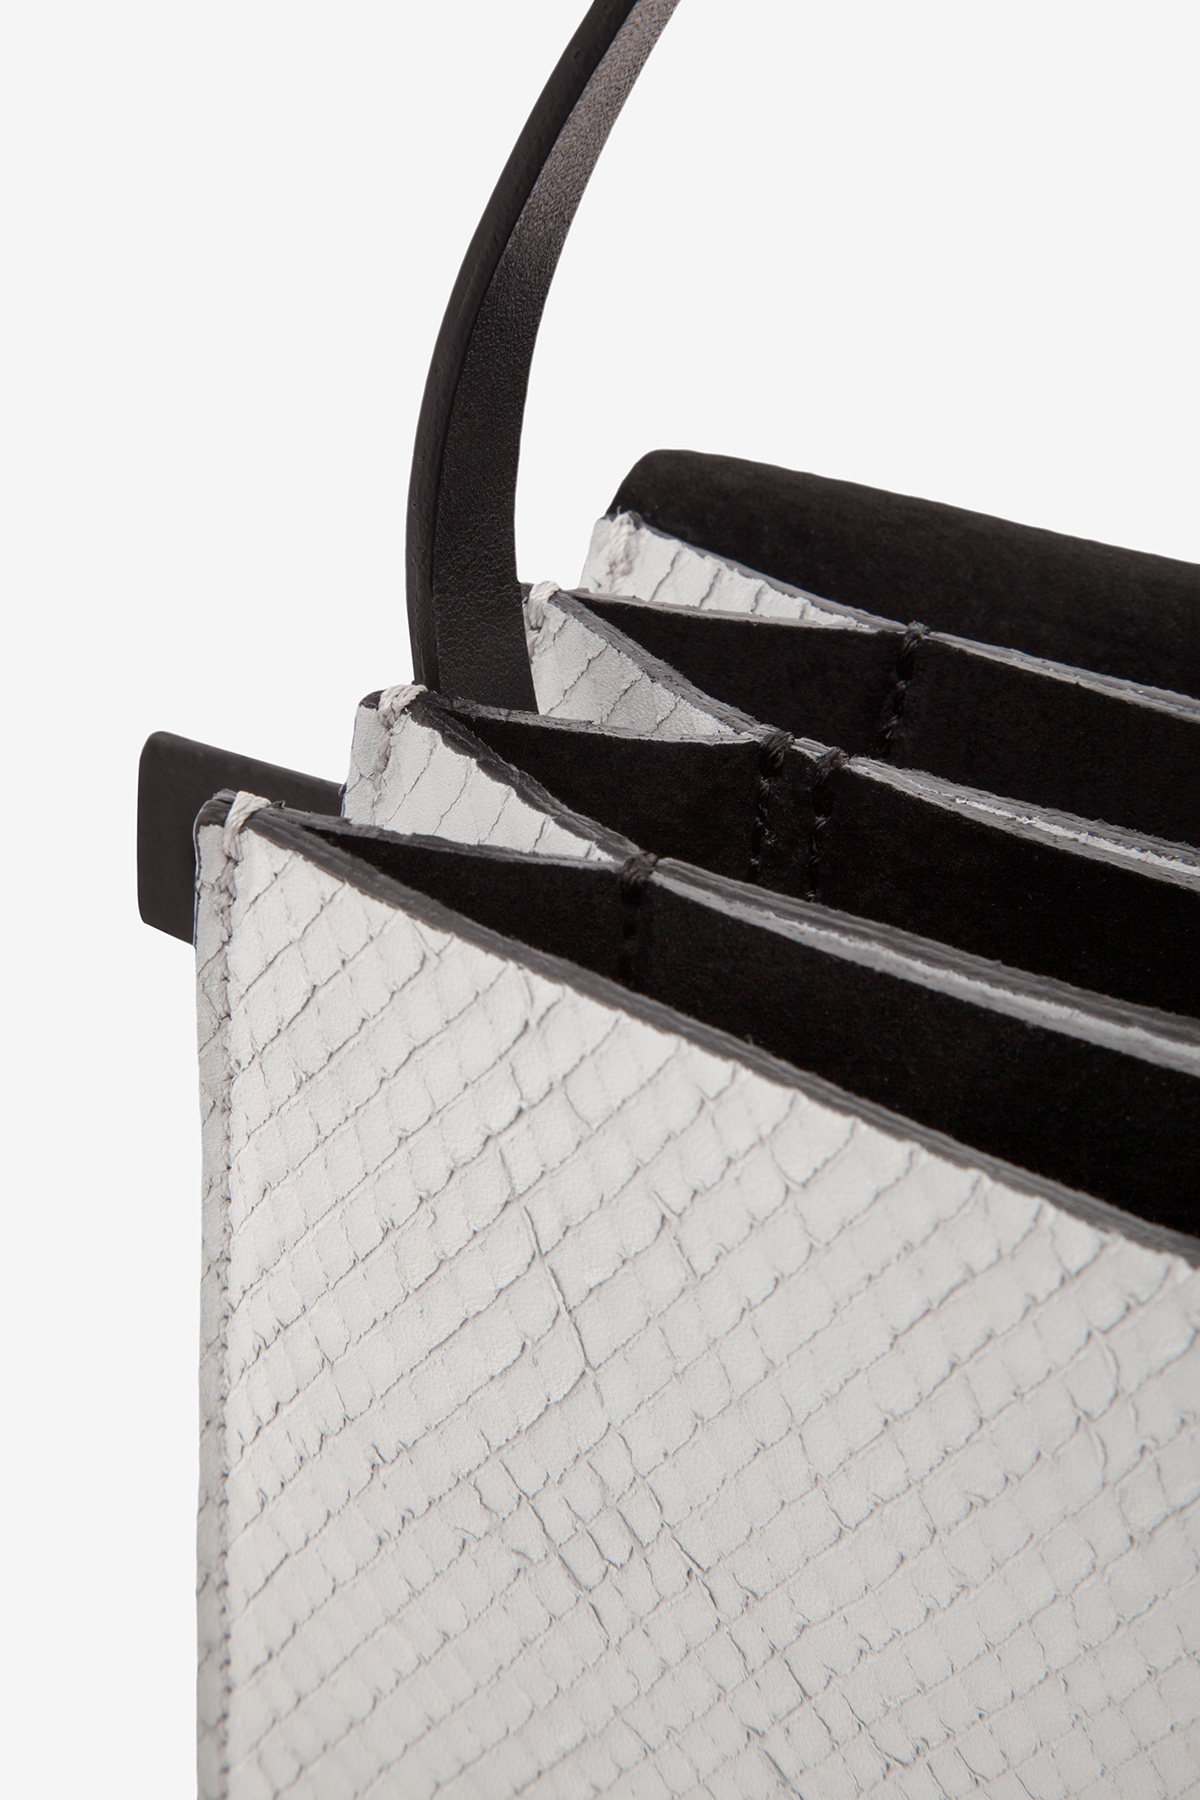 dclr005-clubpurse-a22-backsnakefoggrey-detail